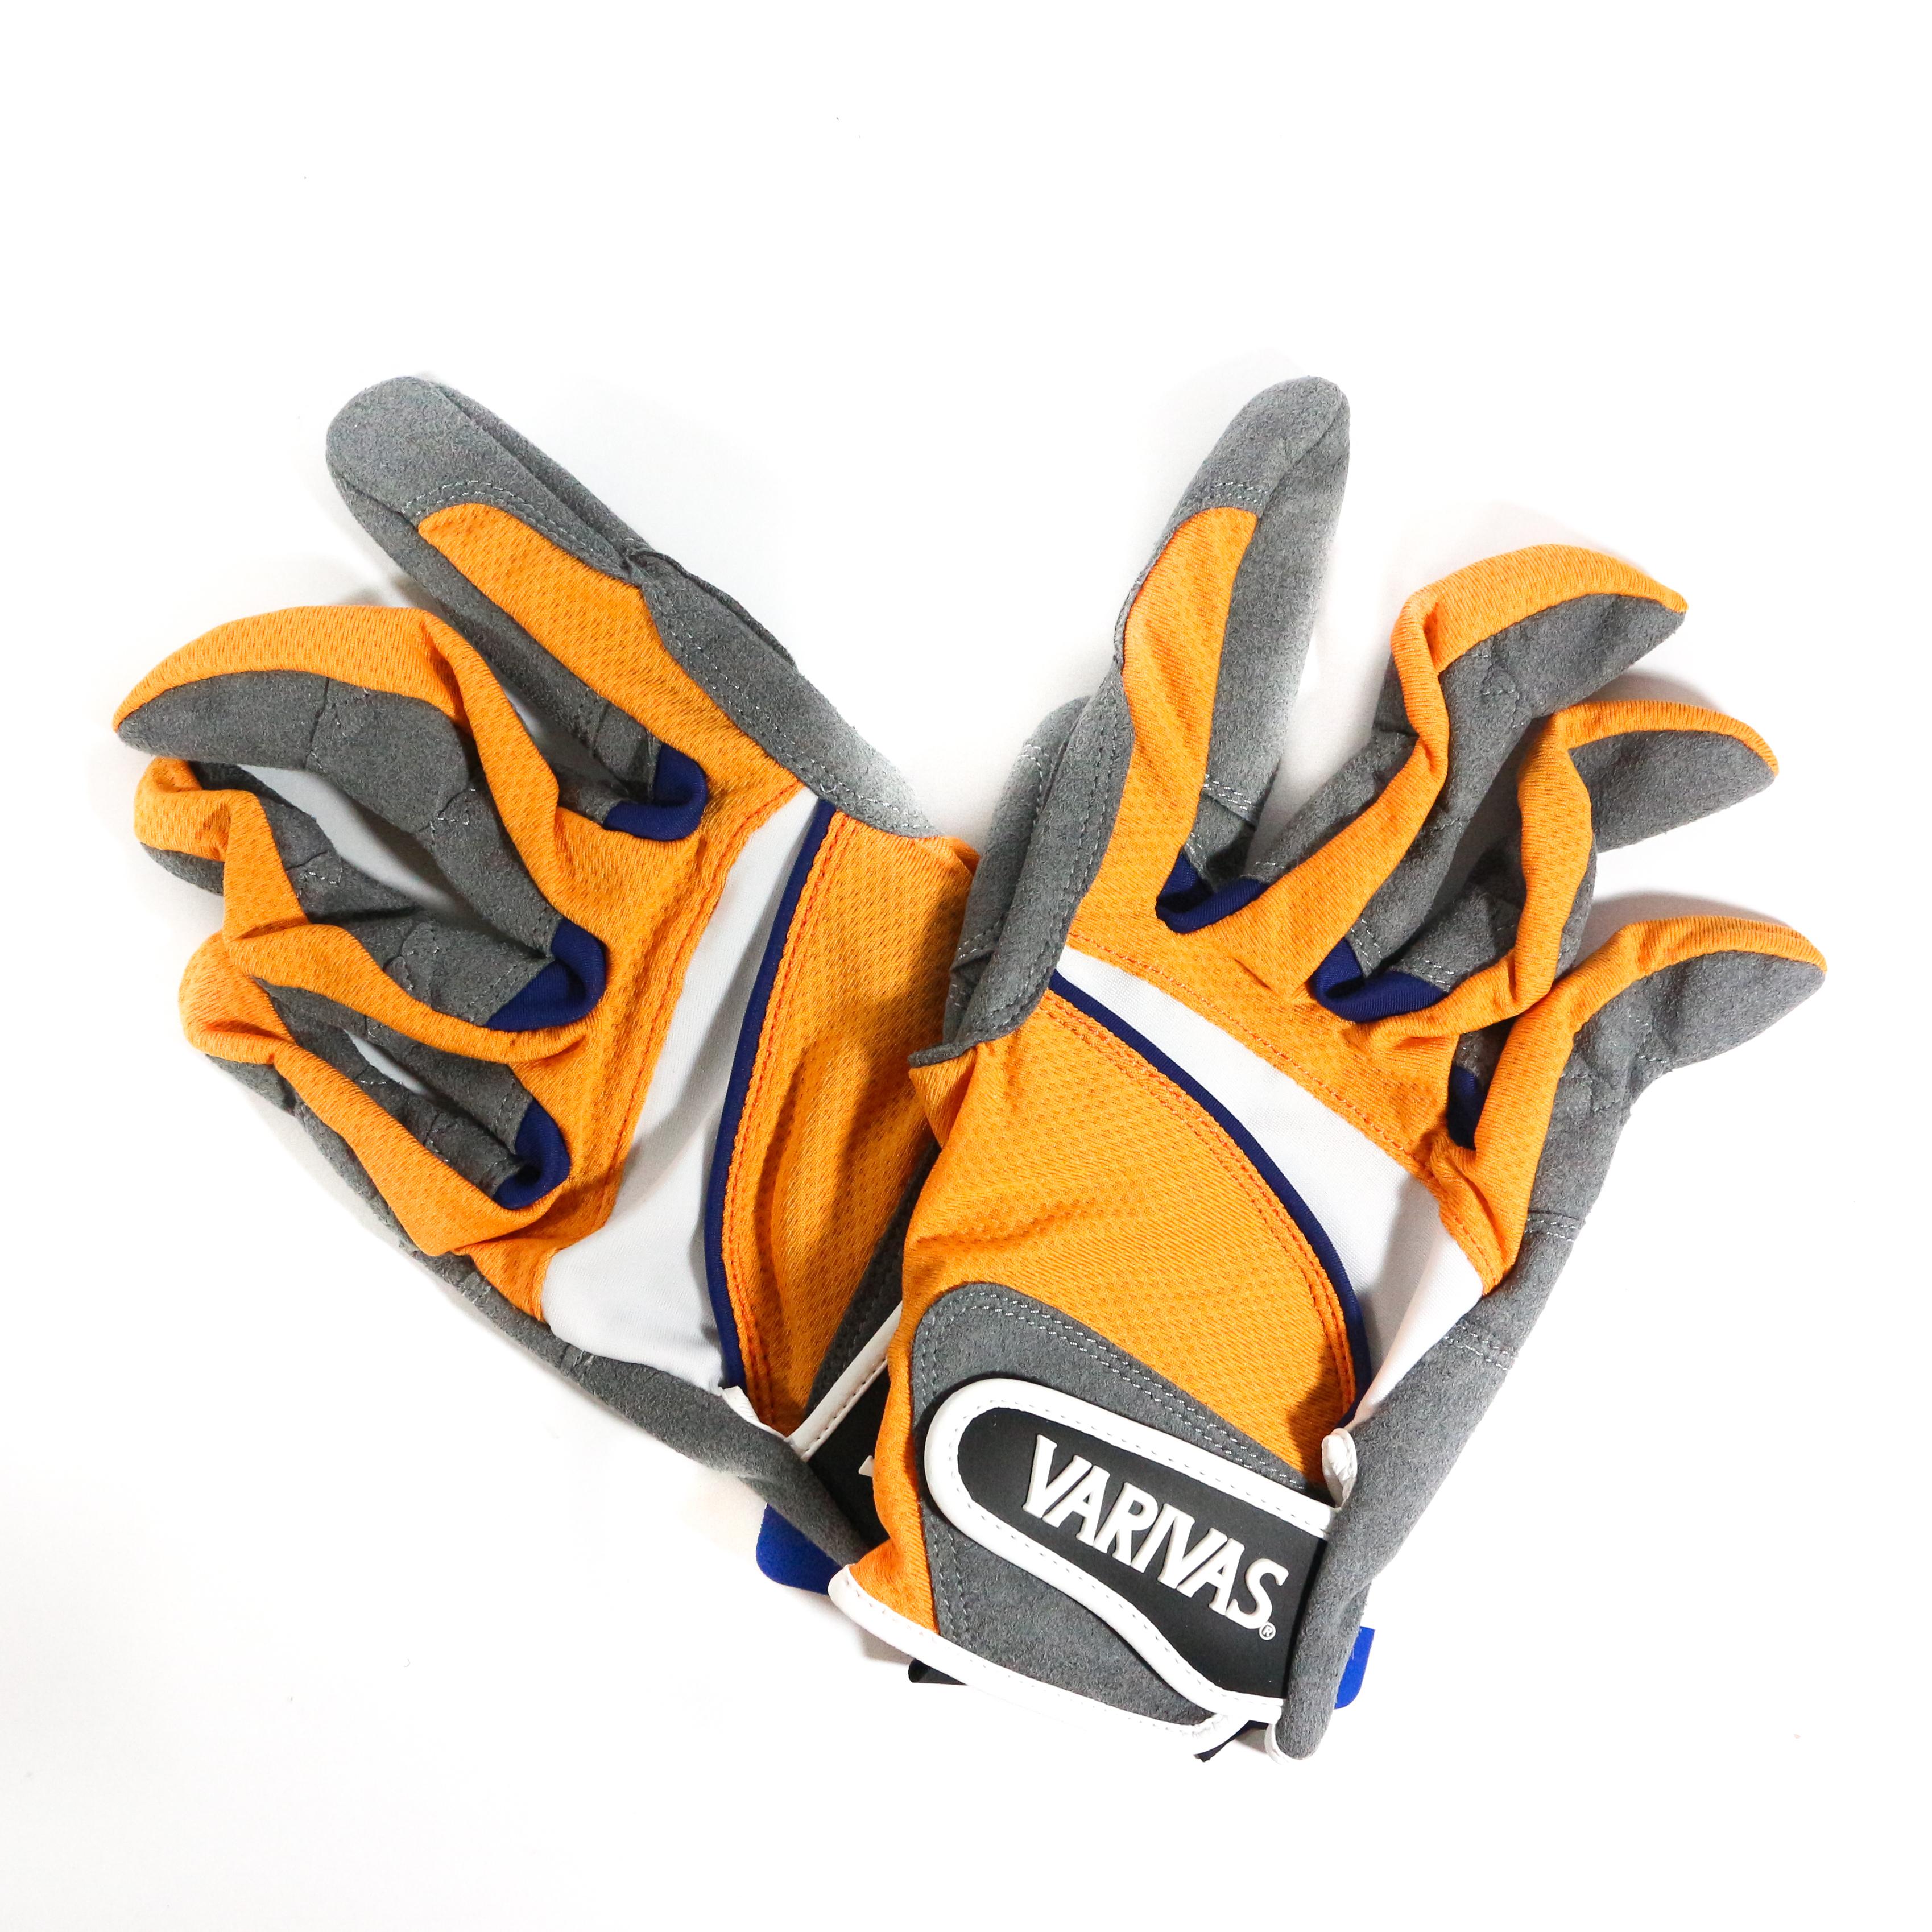 Varivas VAG-20 Mesh Gloves Ergo Grip Orange Size M (0559)